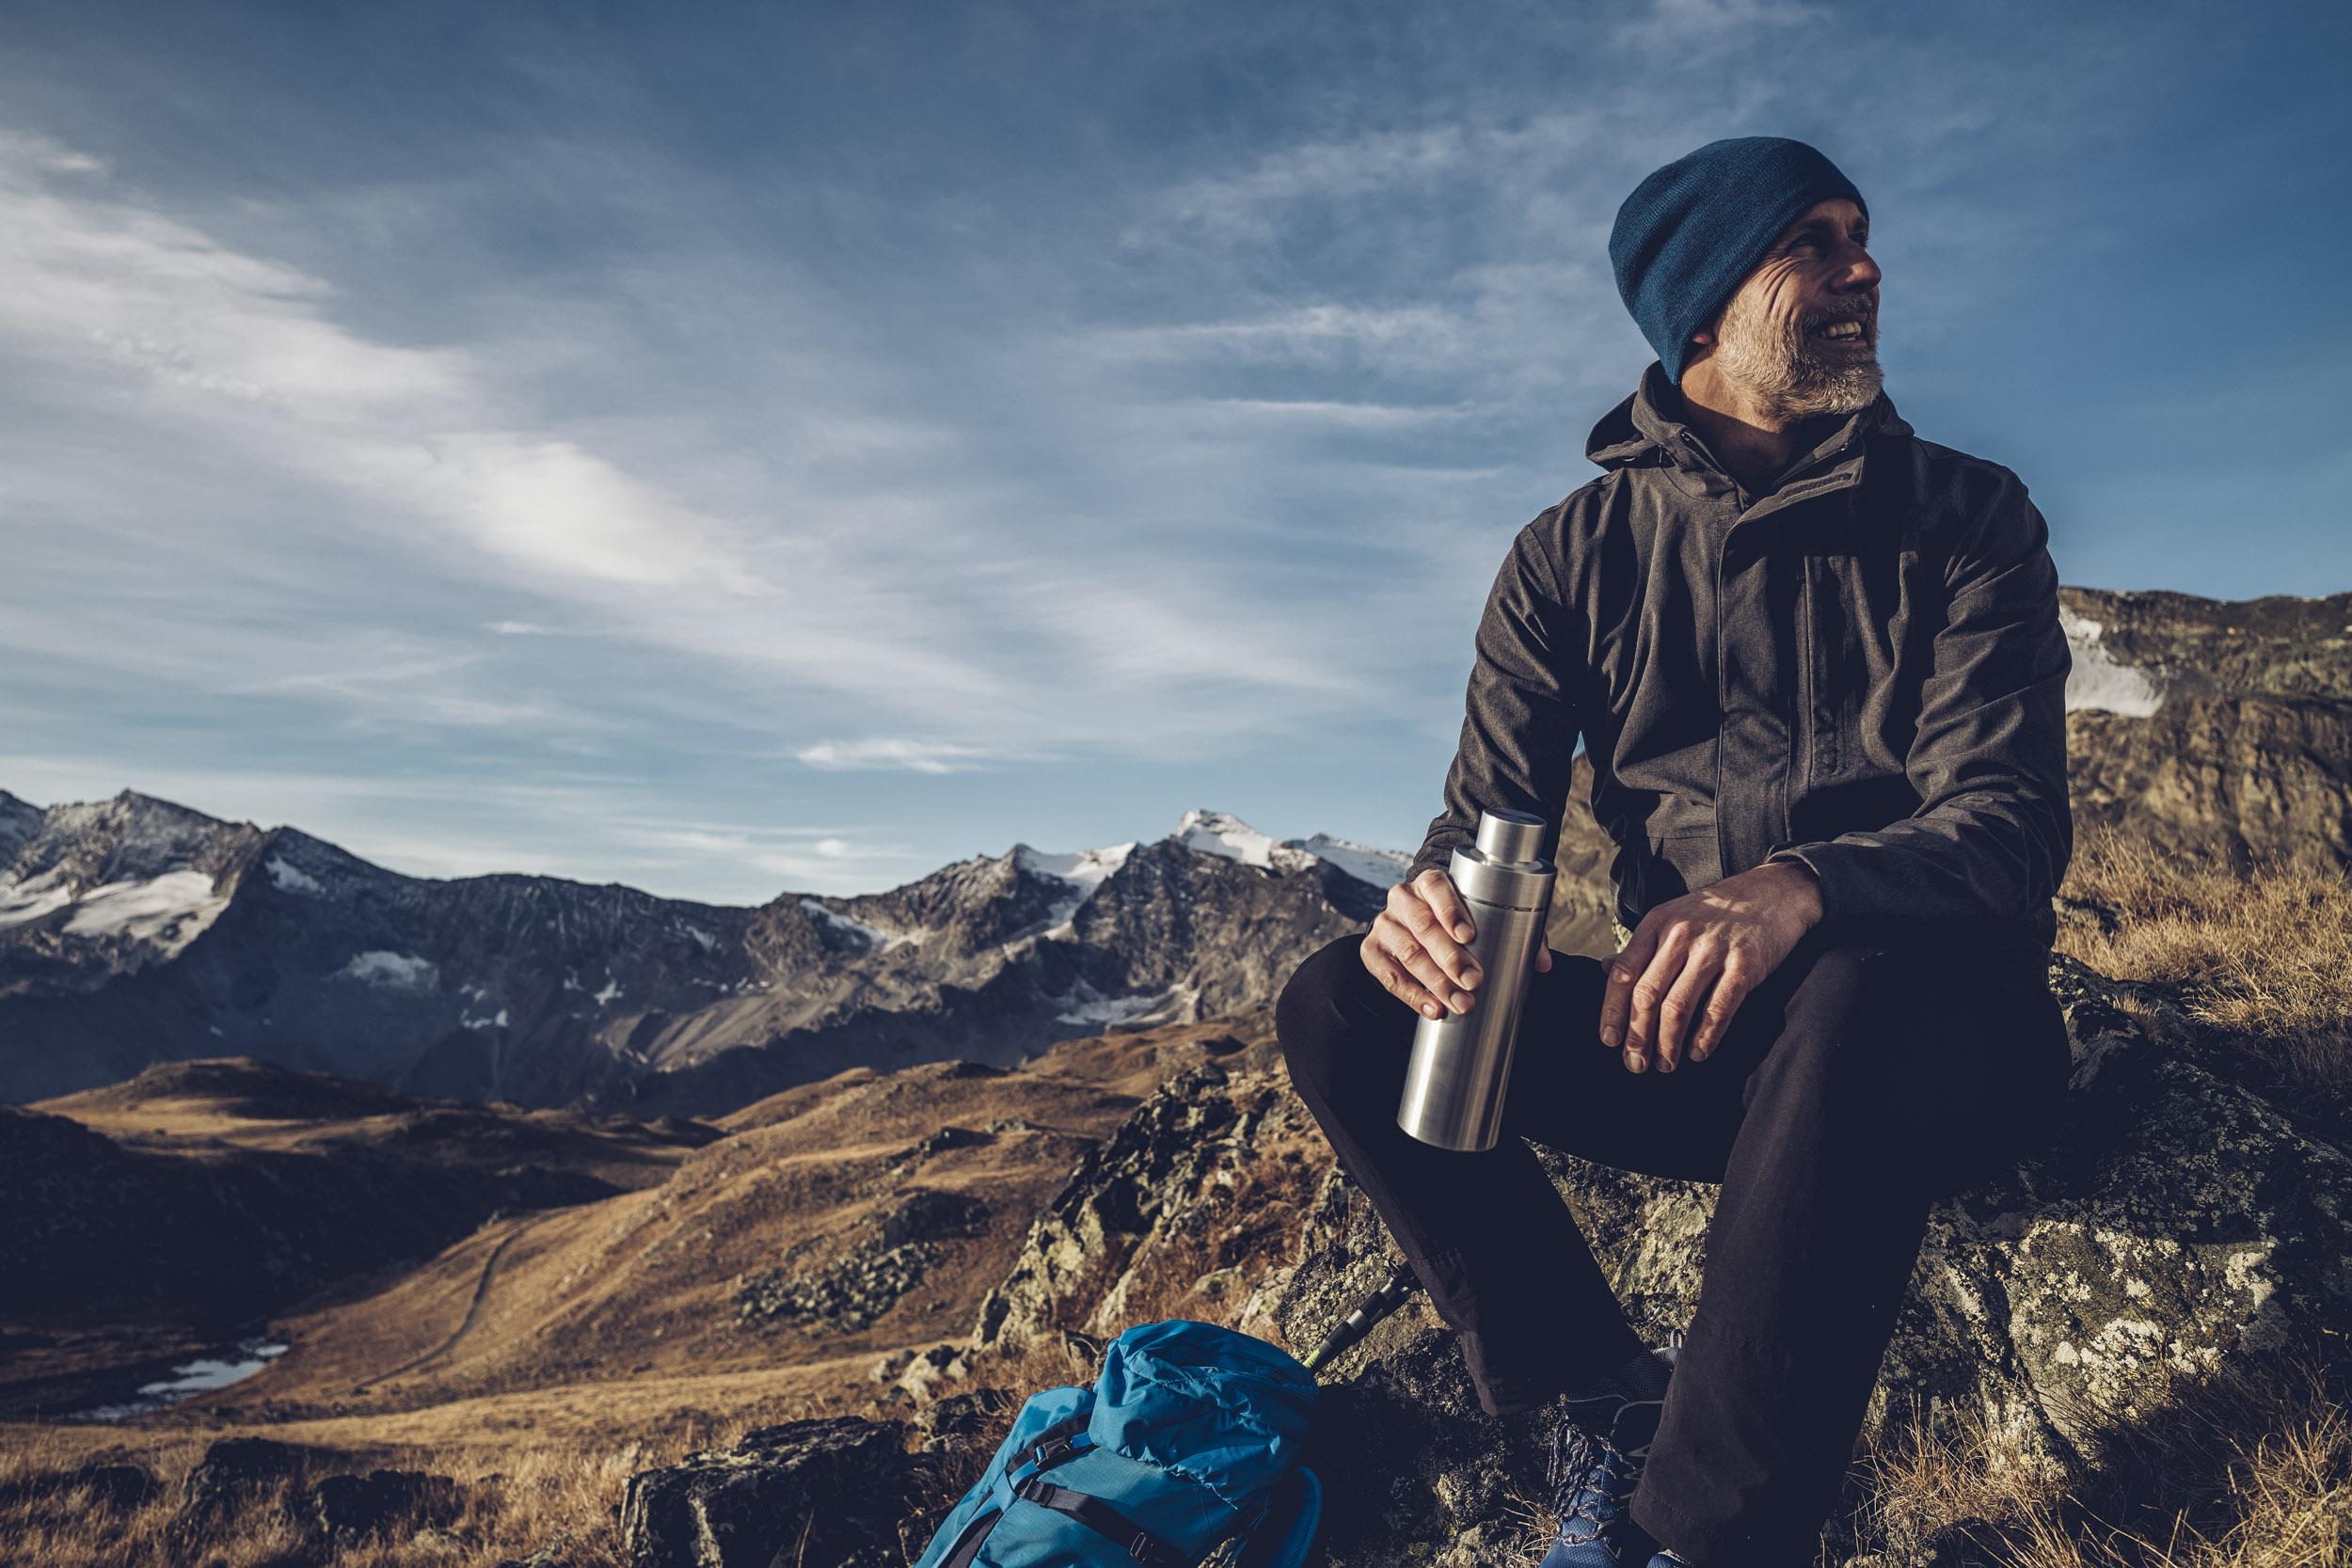 2019-SeifertUebler-luqel-outdoor-mountain-lifestyle004.jpg